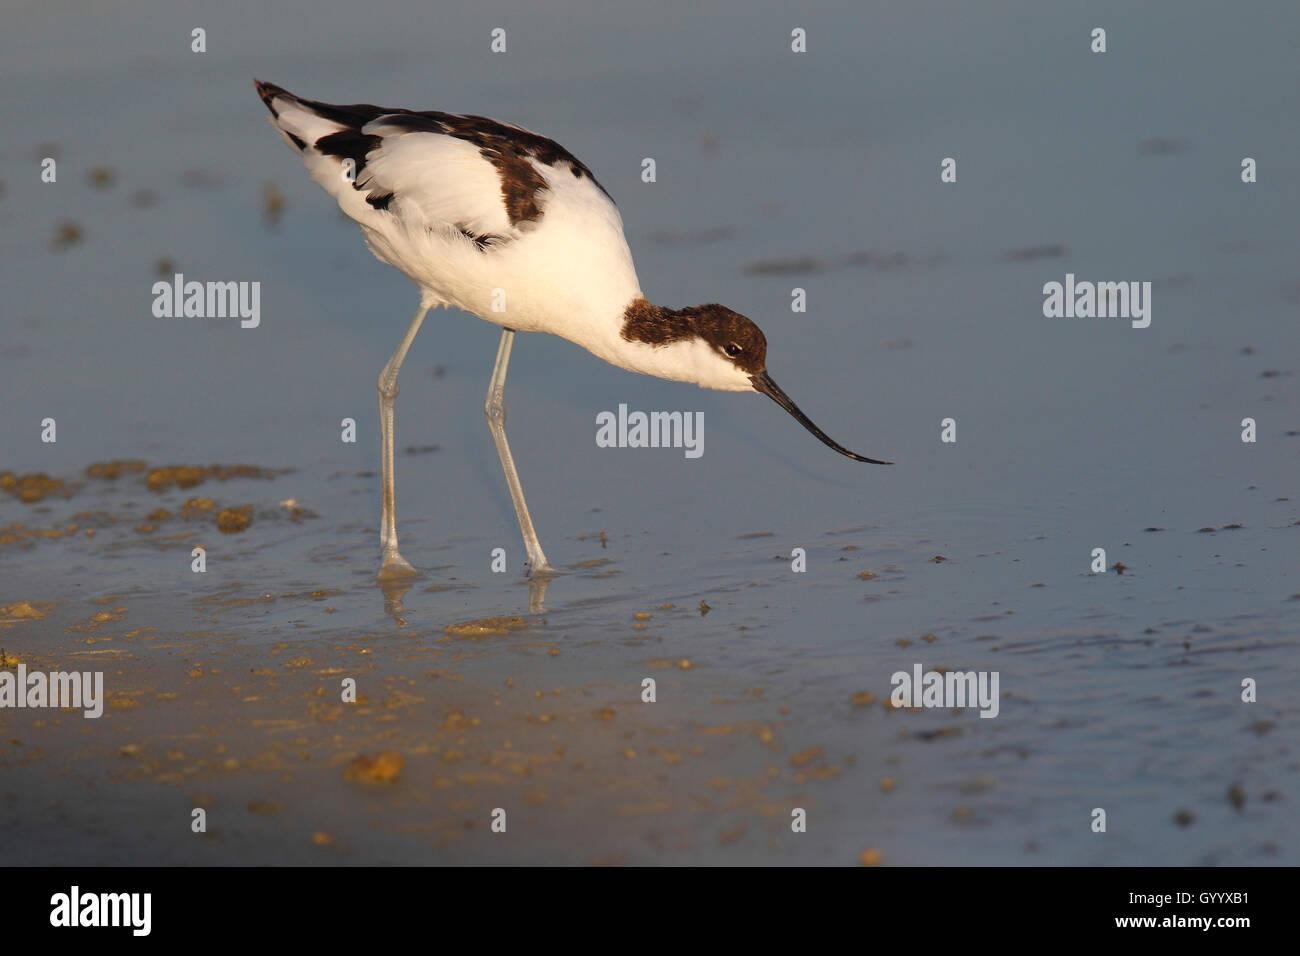 Avocet (Recurvirostra avosetta) searching for food in shallow water, Illmitz, National Park Lake Neusiedl, Burgenland, - Stock Image